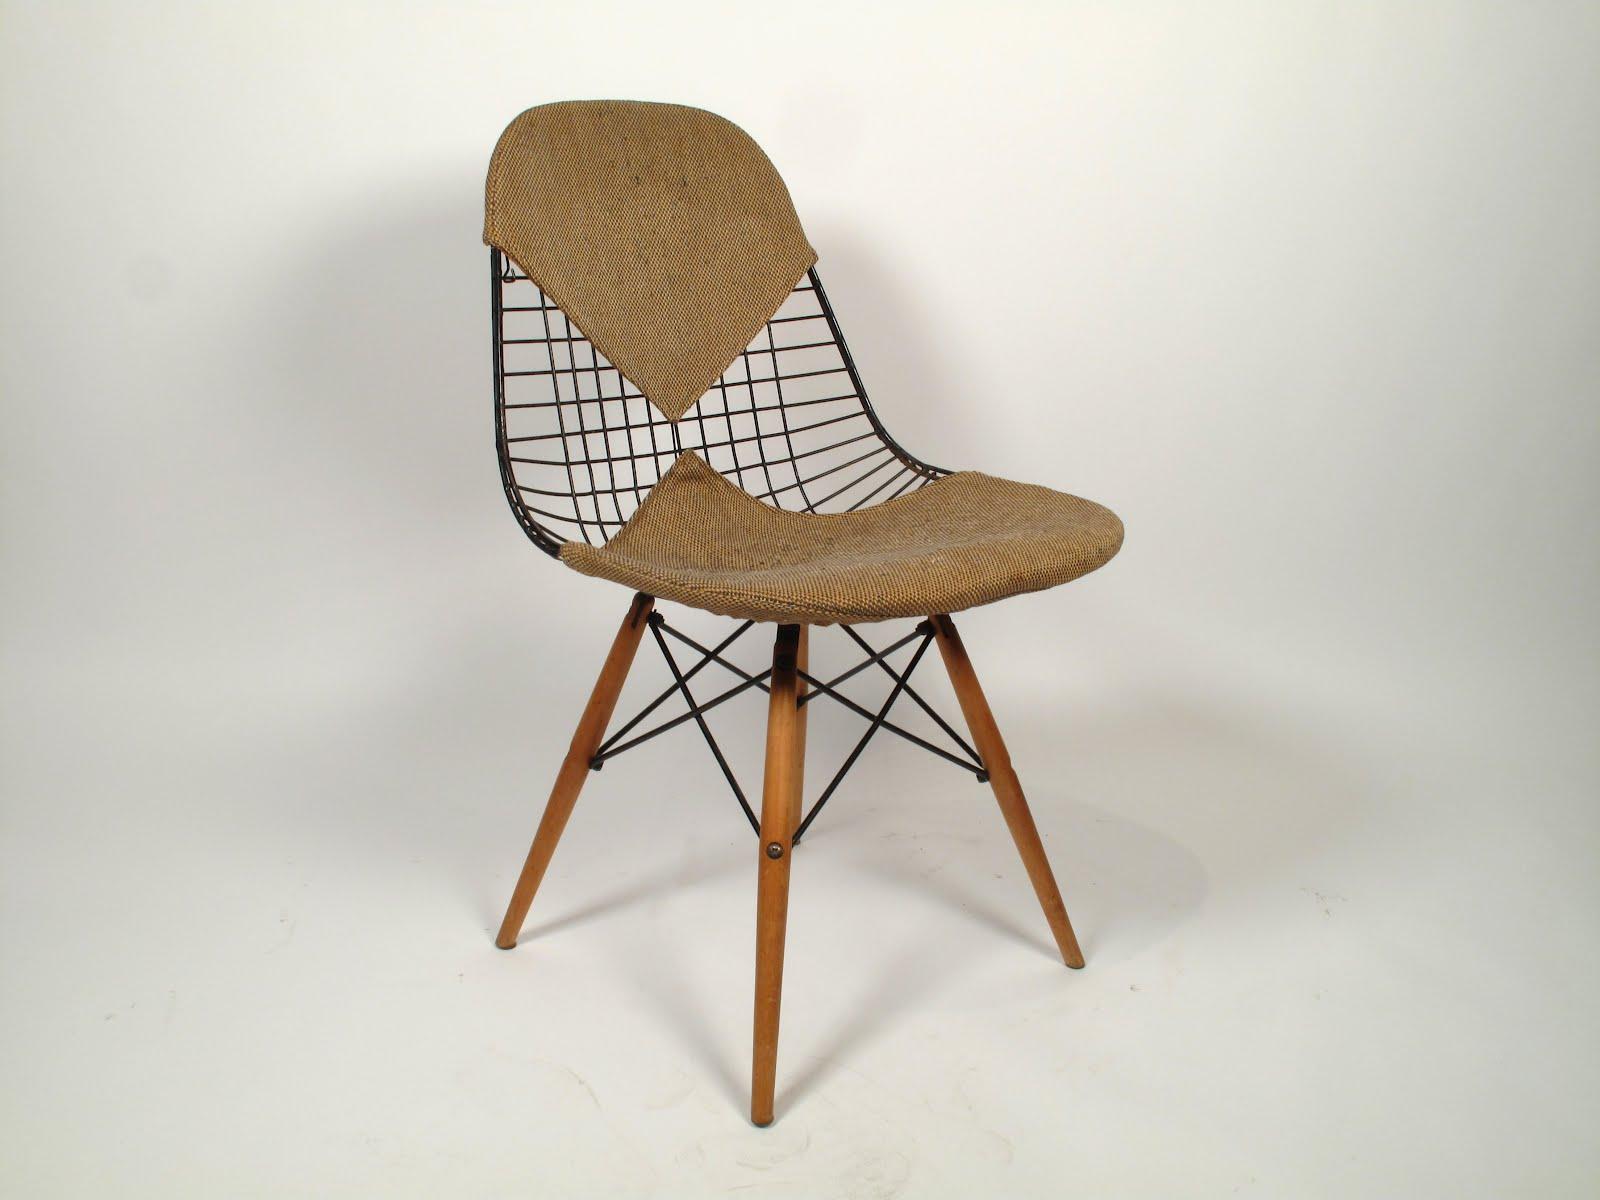 rare eames dkw wire chair with original dowel base and 2 piece bikini